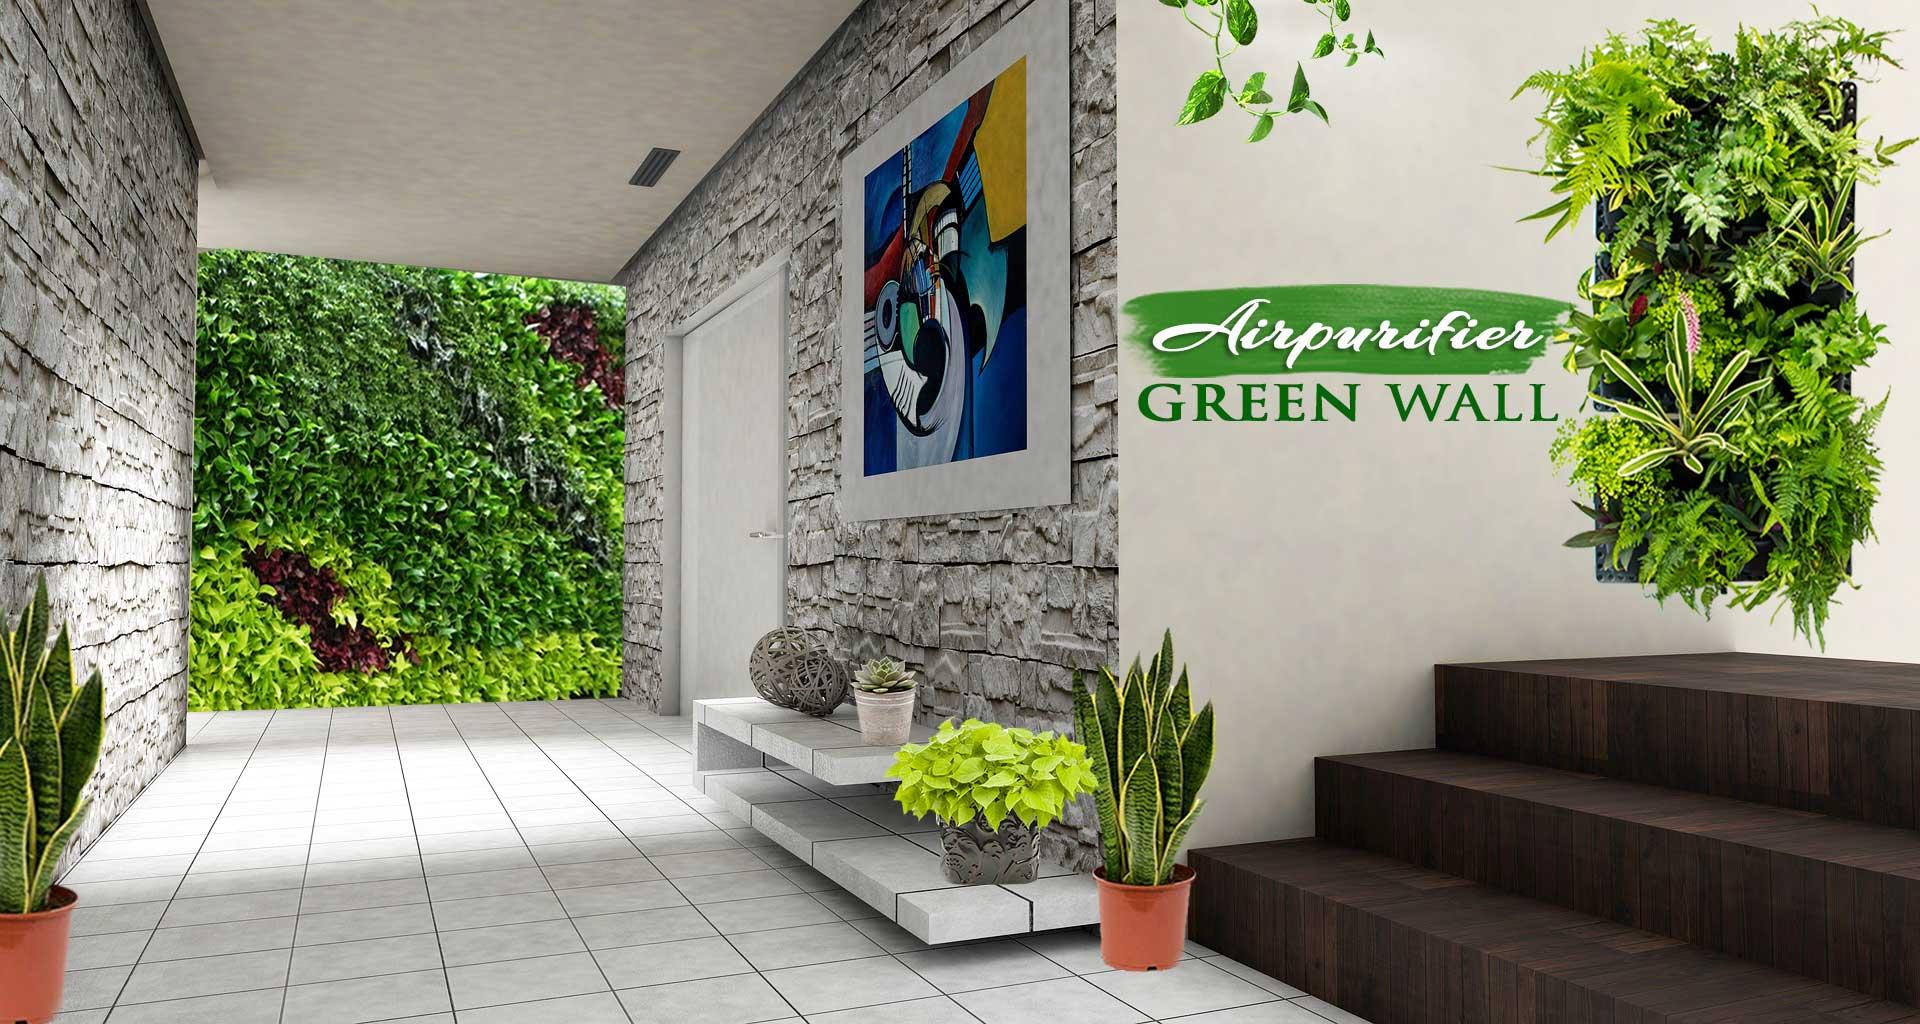 Air Purifier Green Wall Live Oxygen Wall - Green Wall India